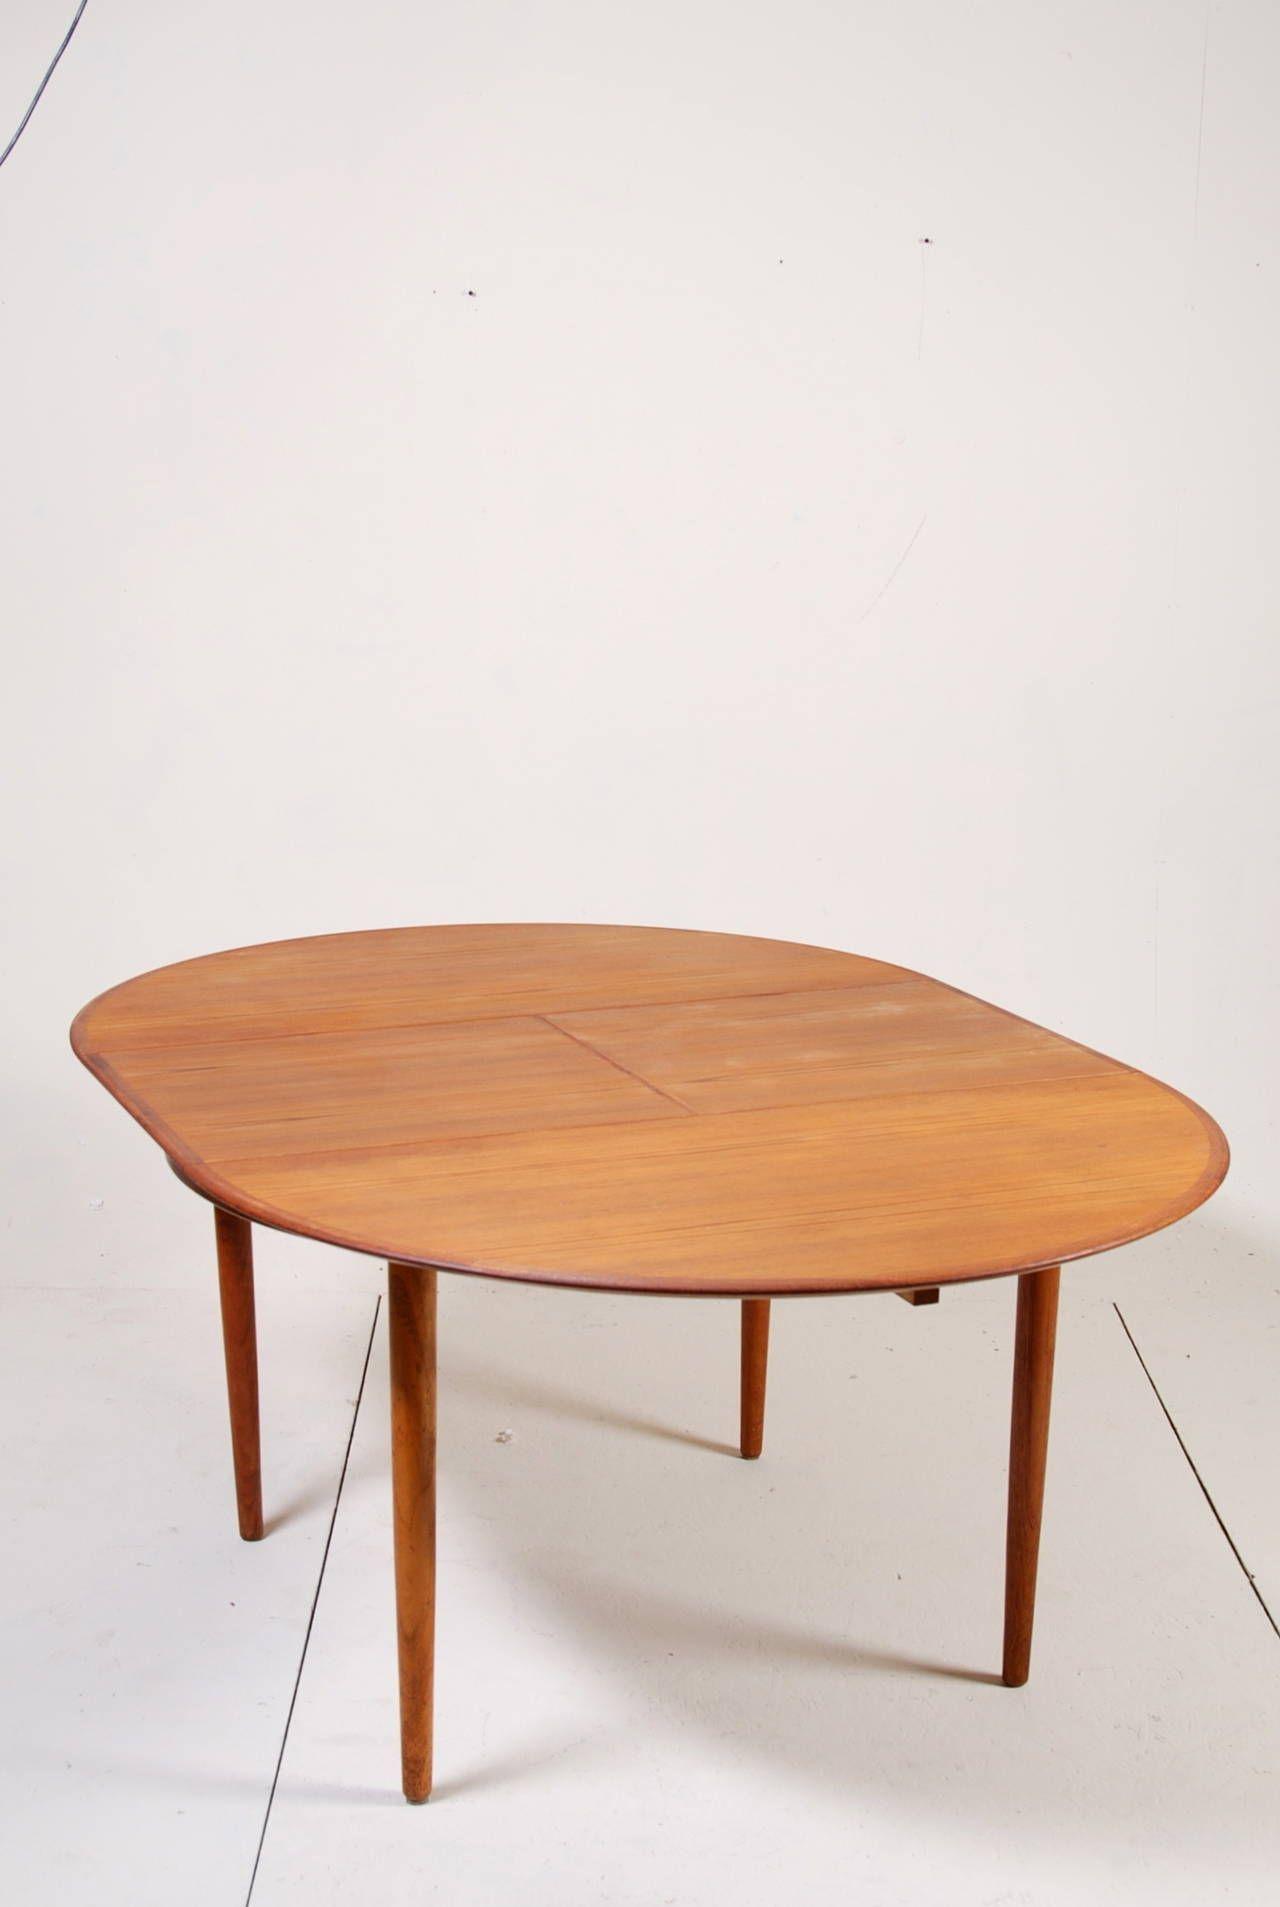 Round Danish Modern Teak Dining Table By Dyrlund Image 4